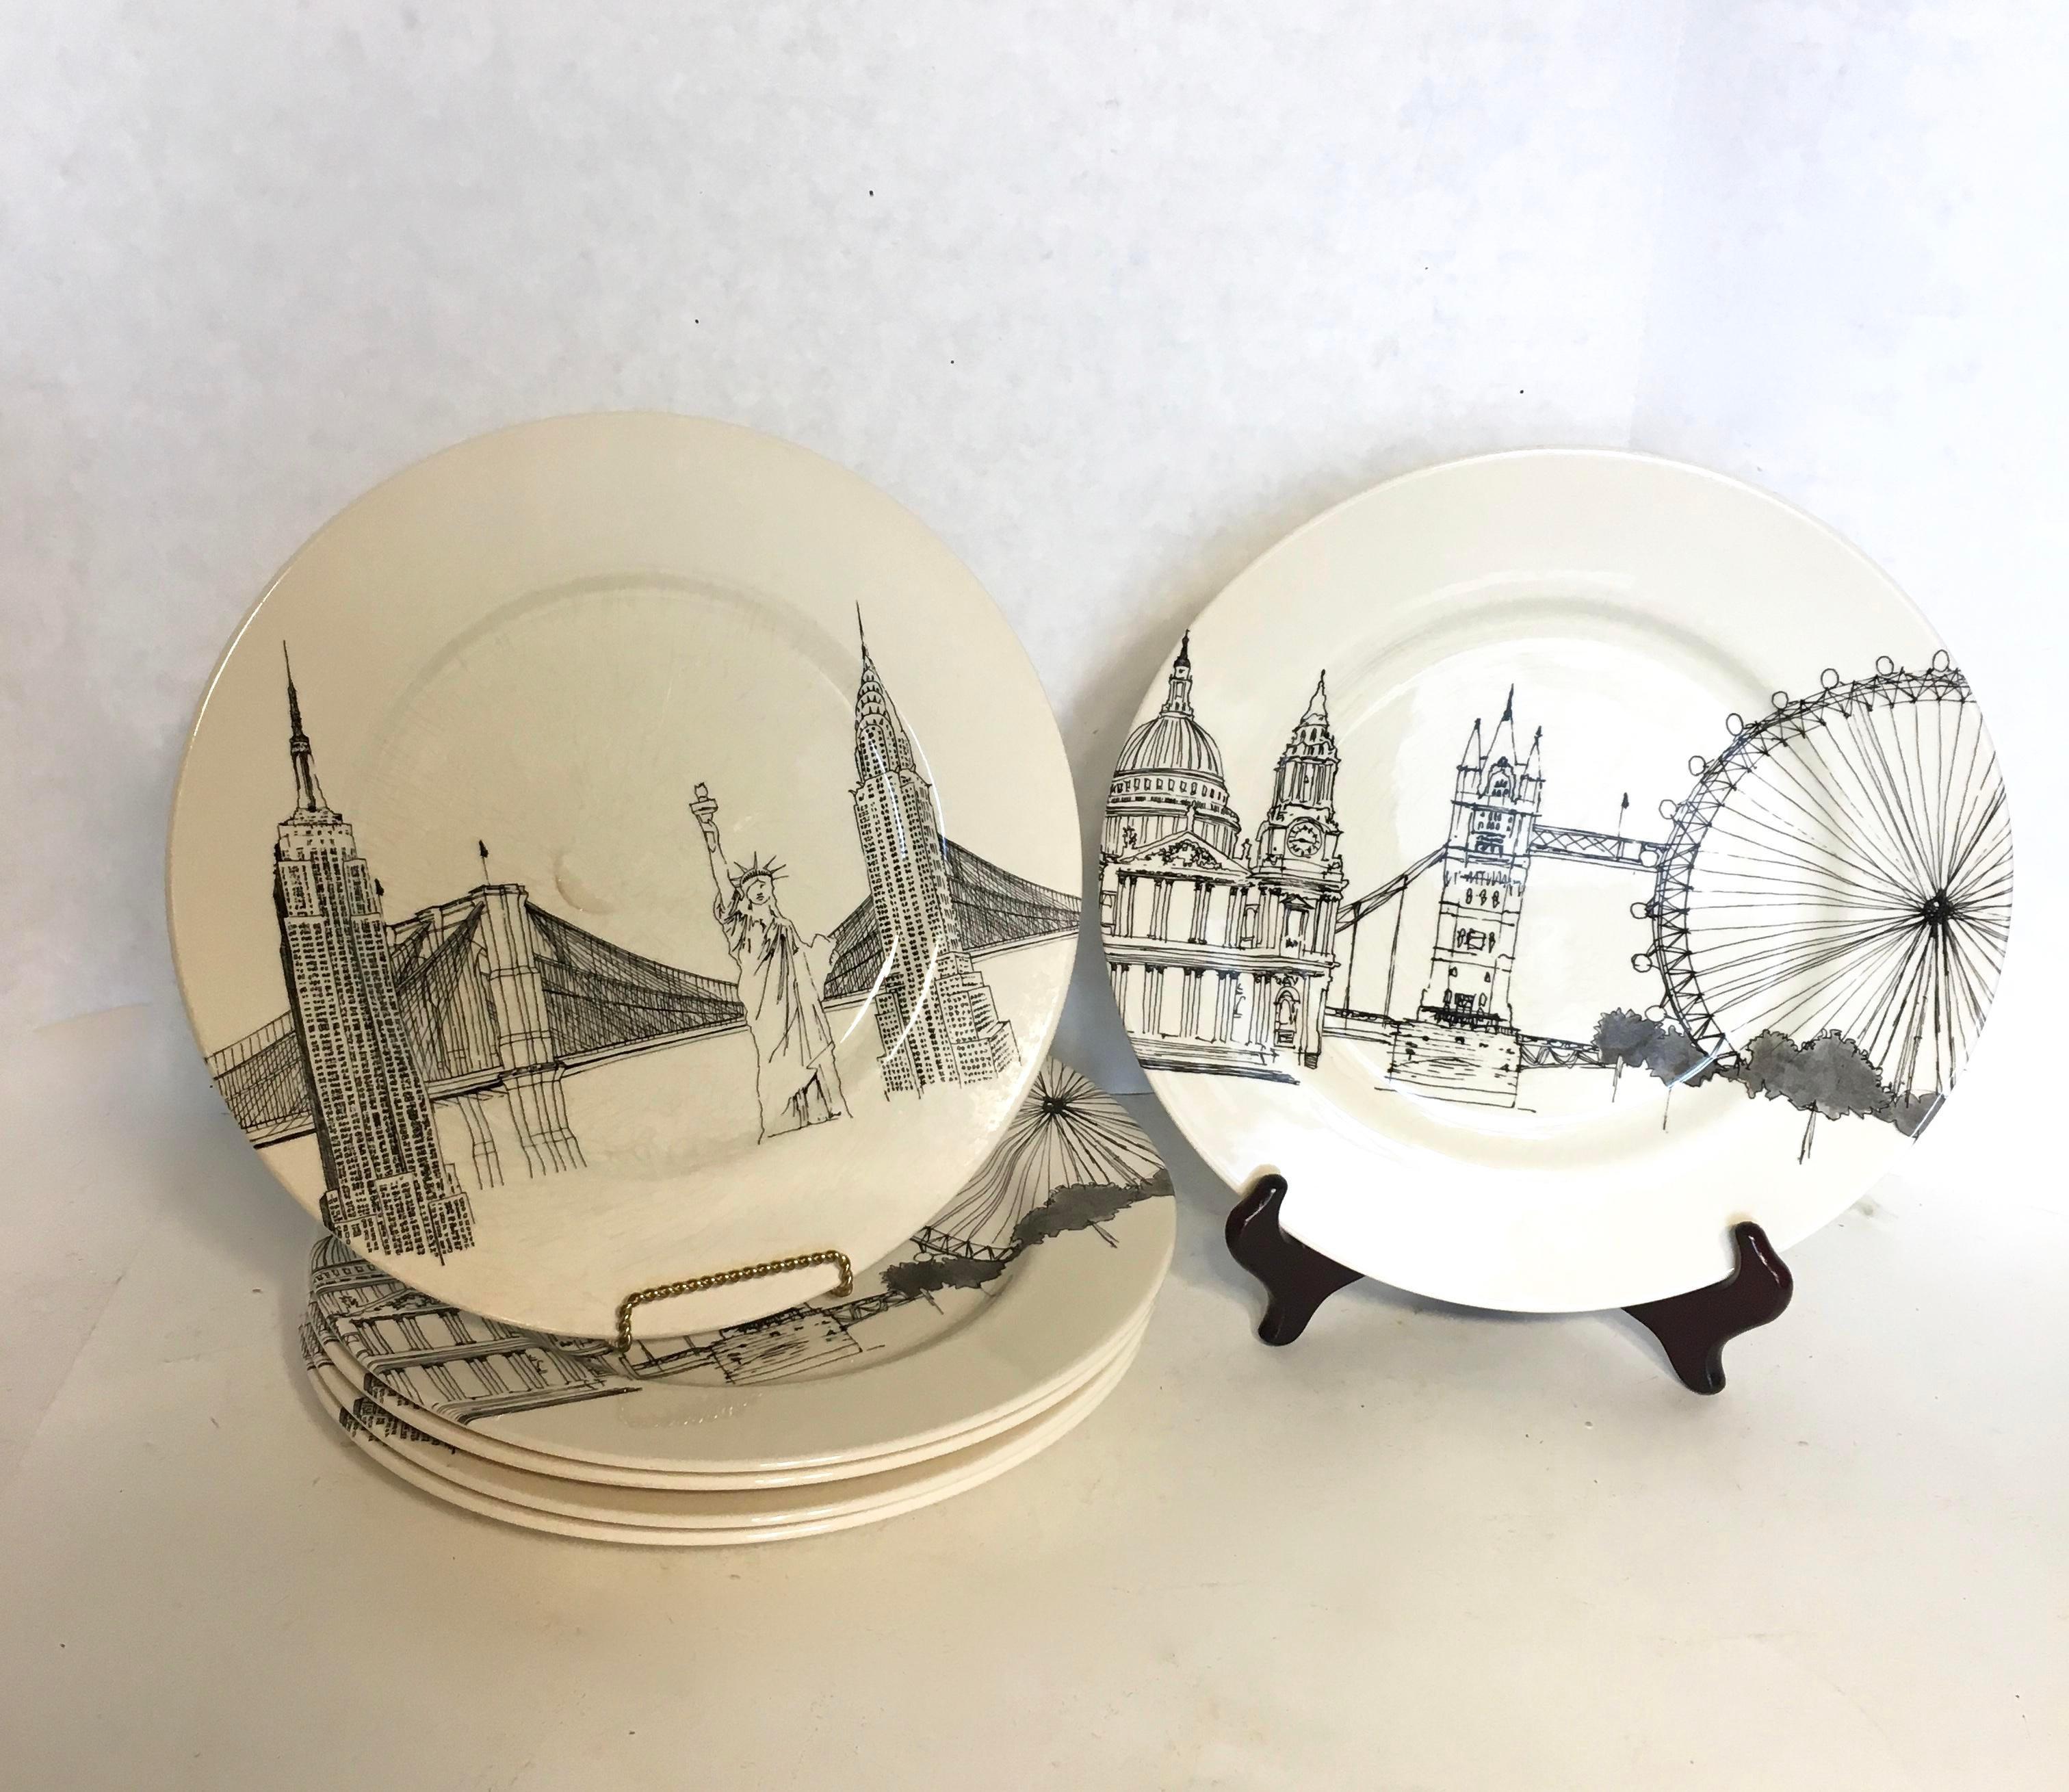 Royal Stafford New York \u0026 London Scenic Plates - Set of 6 - Image 3 of  sc 1 st  Chairish & Royal Stafford New York \u0026 London Scenic Plates - Set of 6 | Chairish